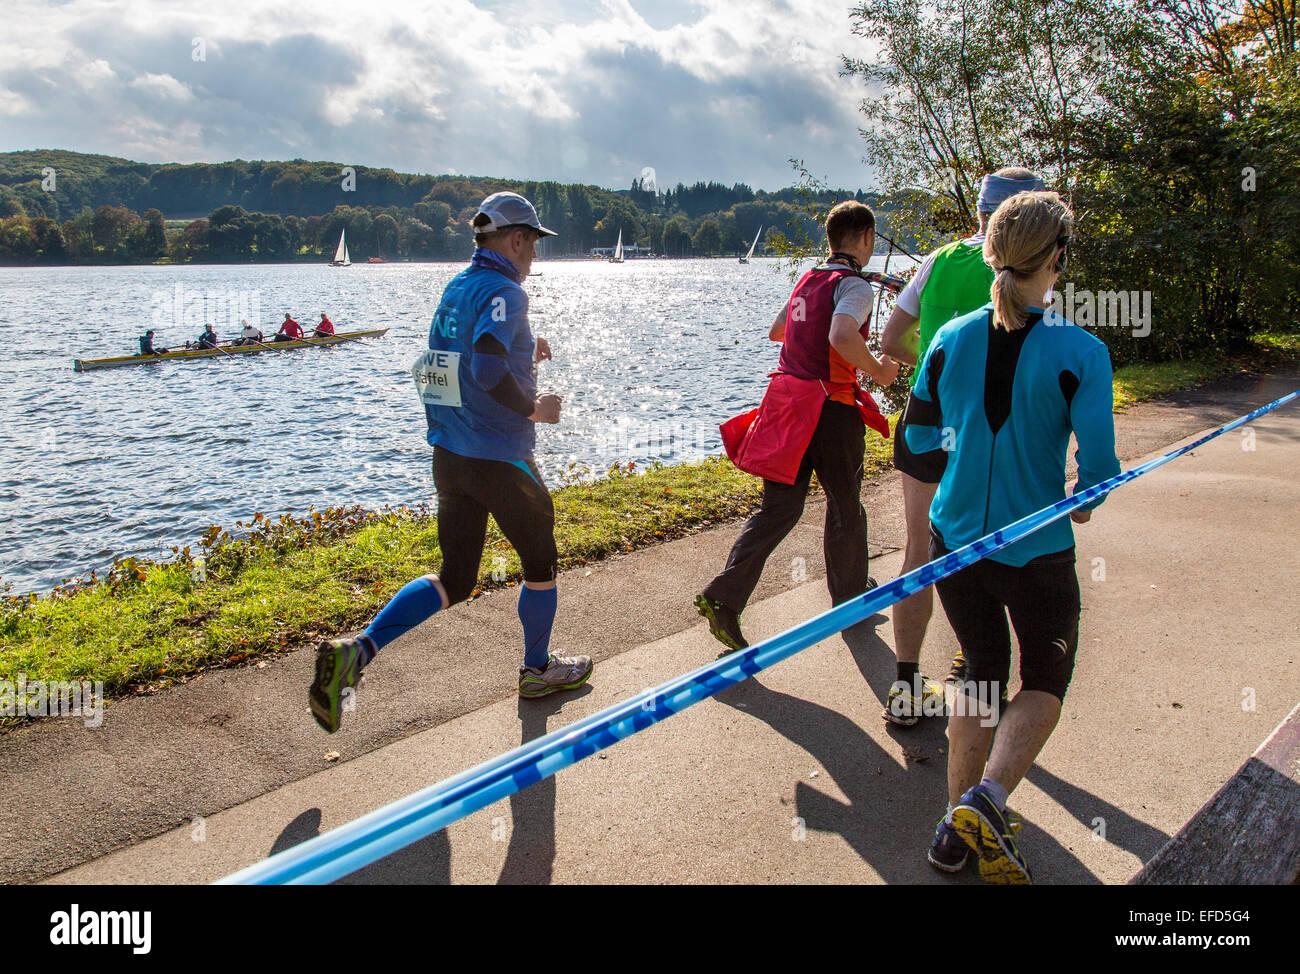 Marathon around the 'Baldeneysee' lake, Essen, Germany - Stock Image